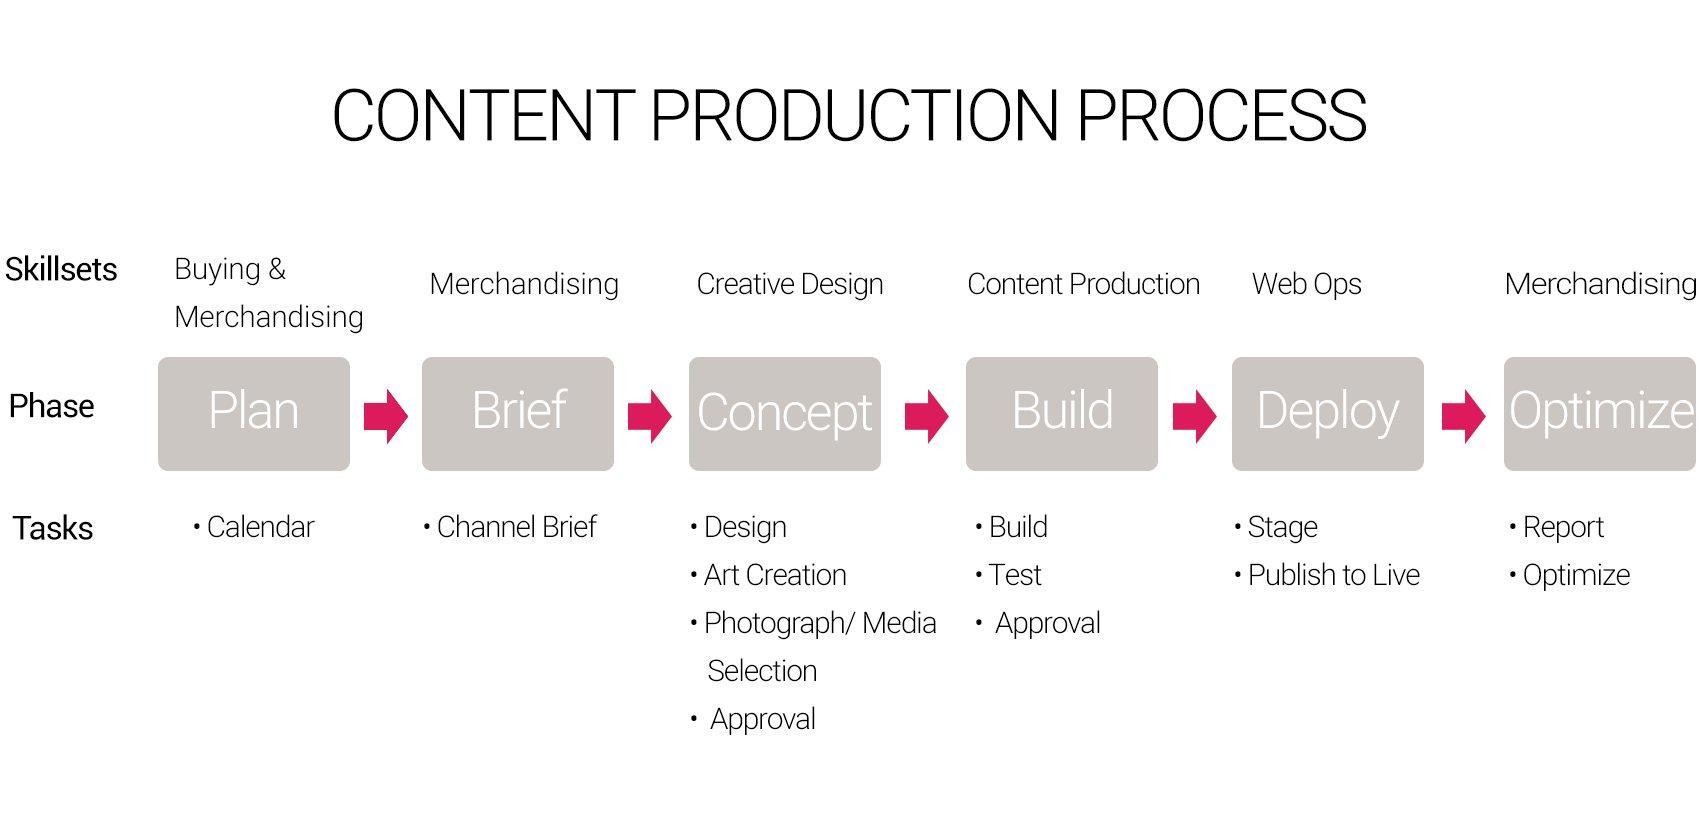 ContentProductionProcess_1